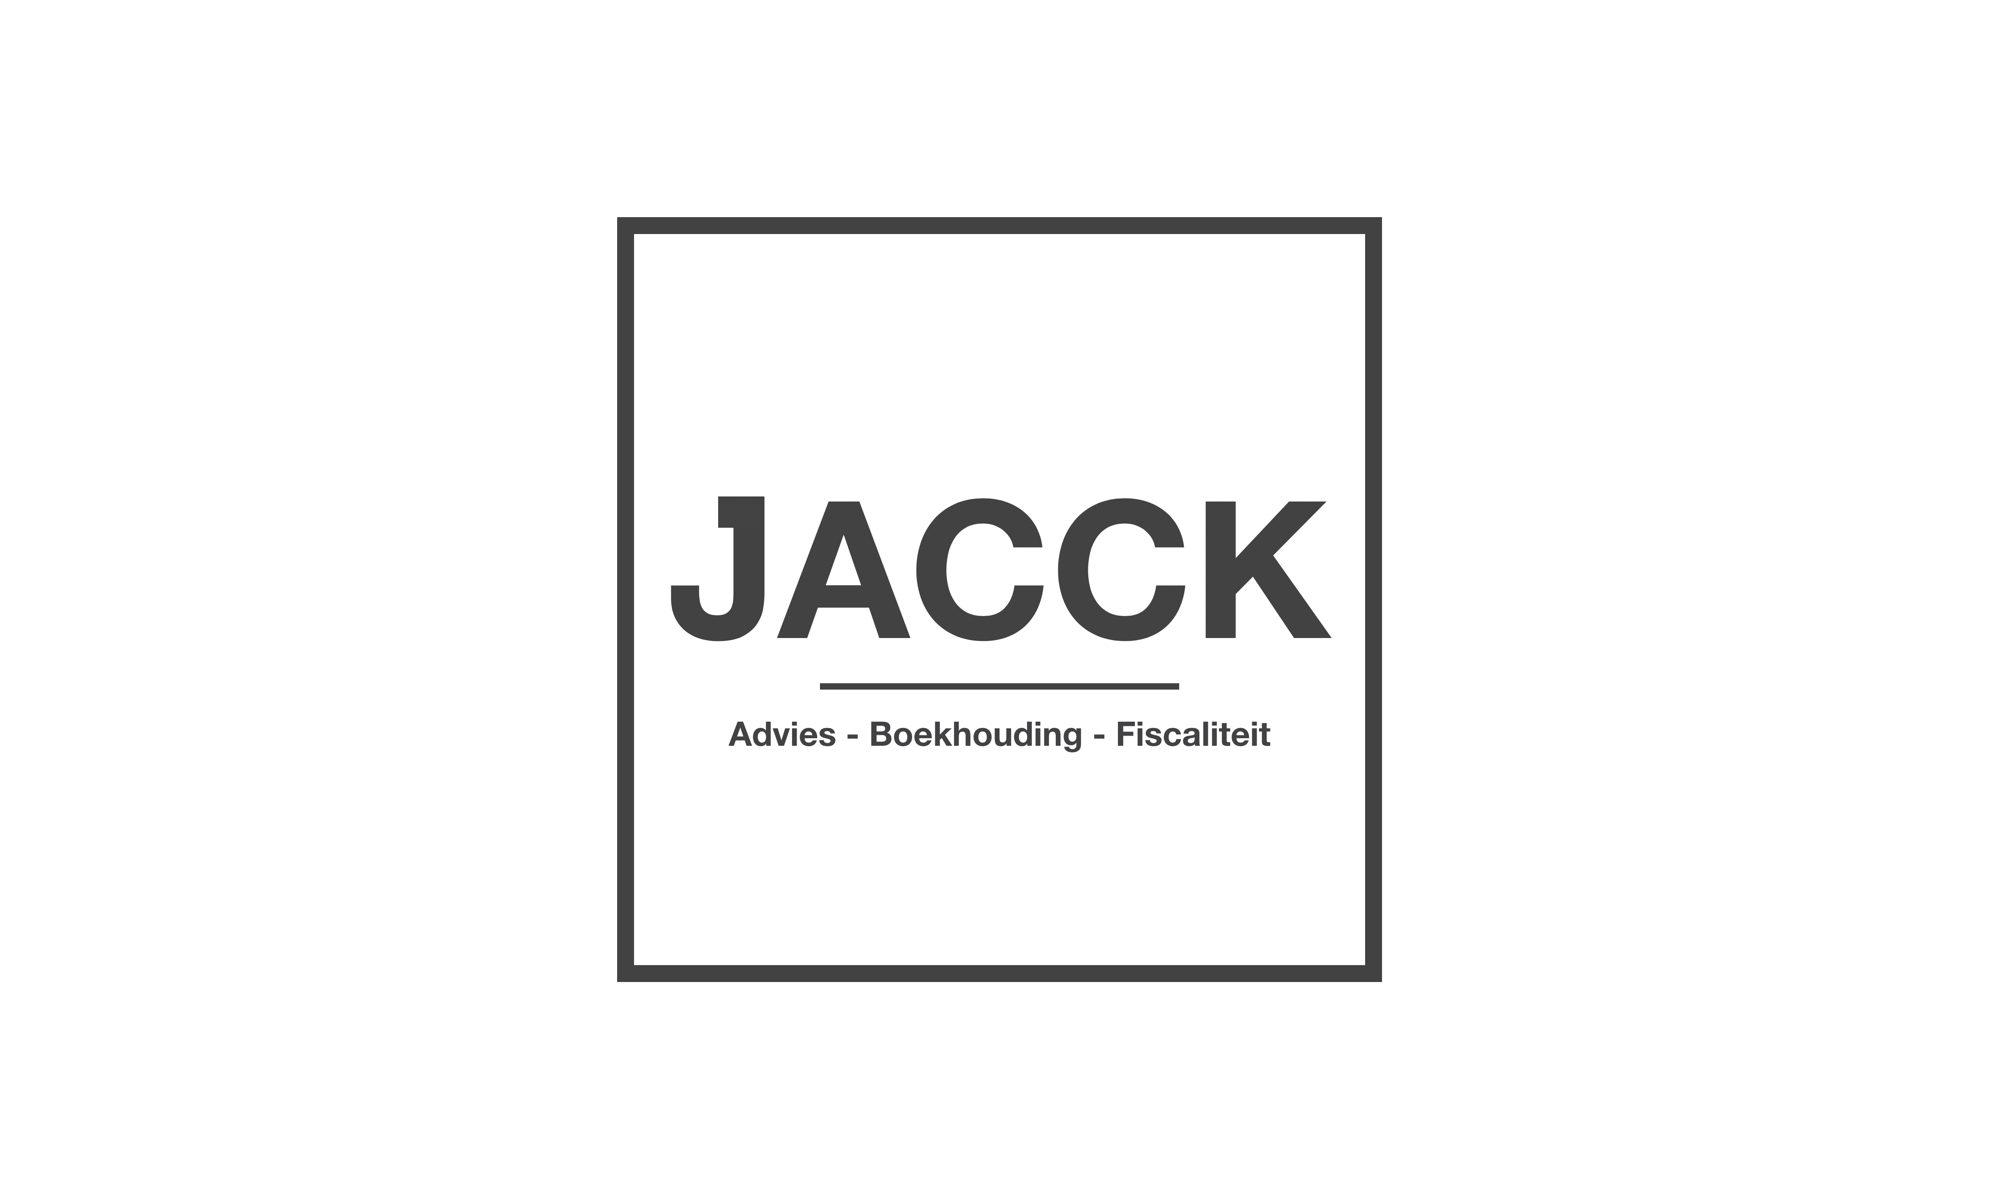 JACCK